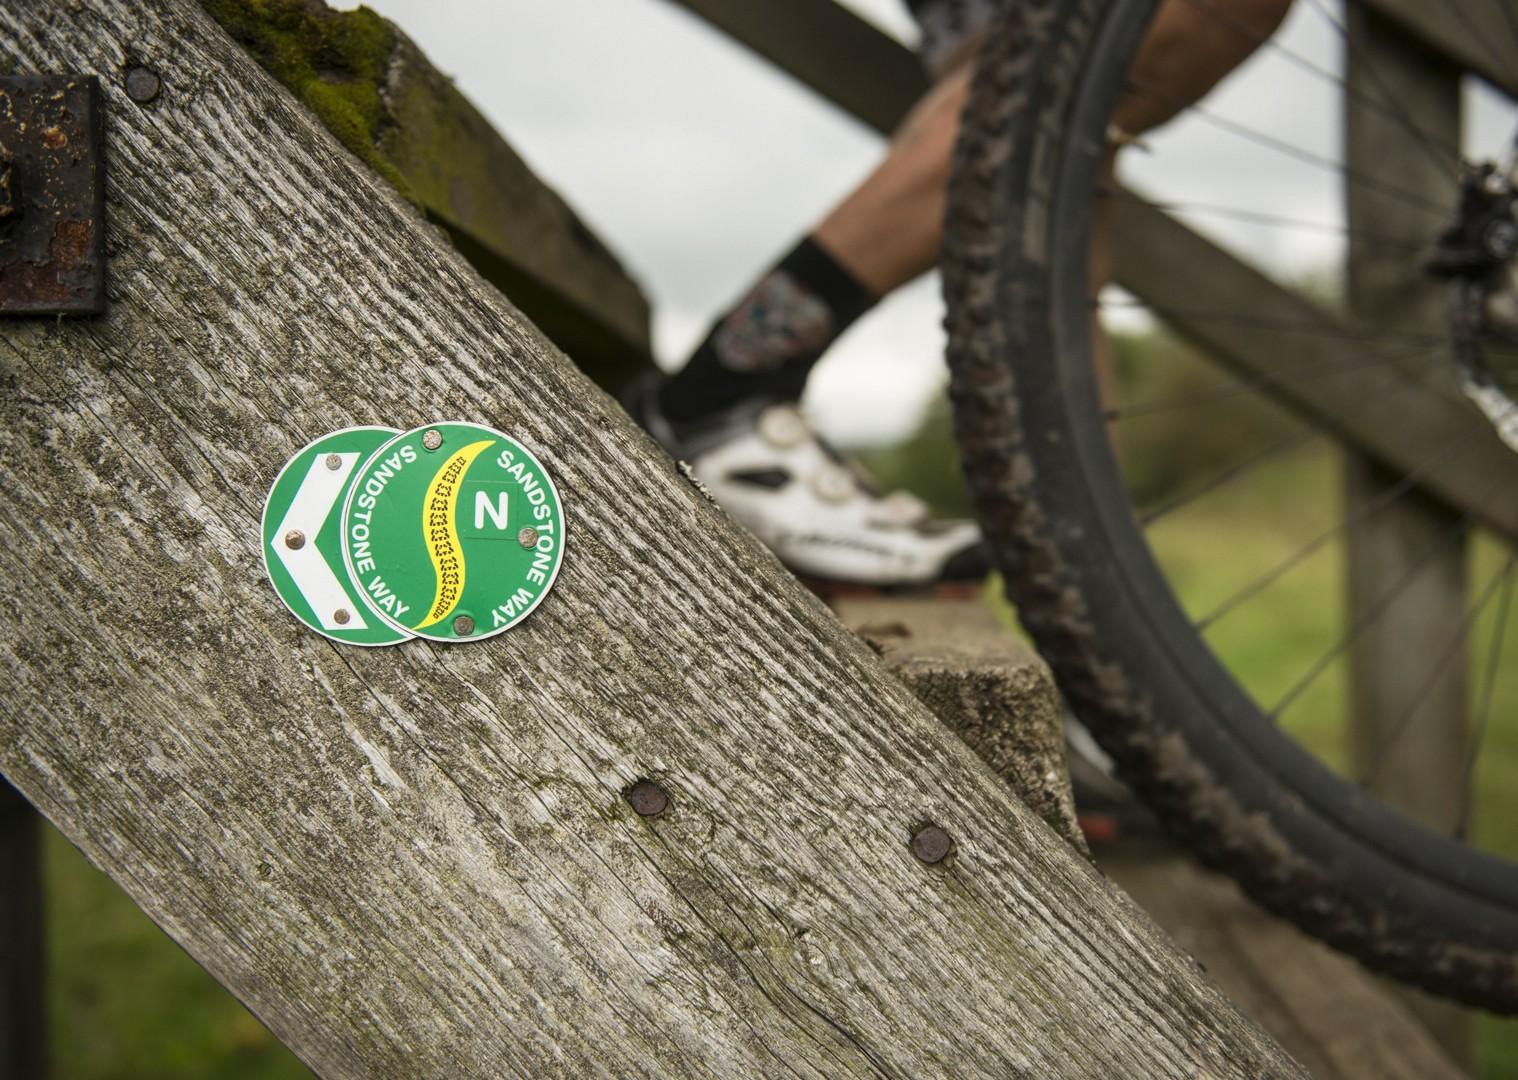 sandstone-way-rothwell-204.jpg - UK - Northumberland - Sandstone Way - Mountain Biking